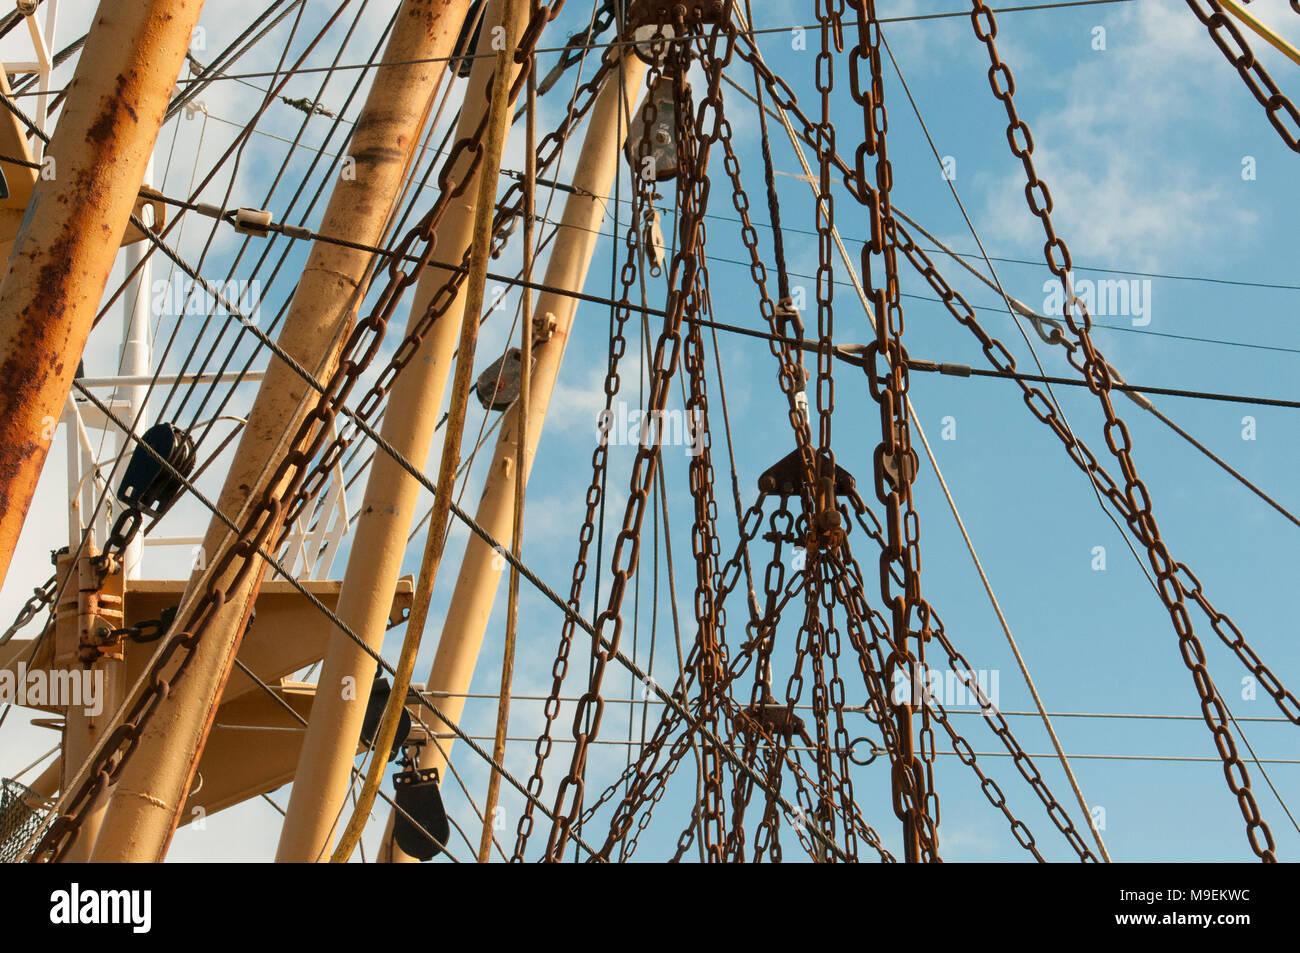 Fish Boat Haul Catch Stock Photos & Fish Boat Haul Catch ...